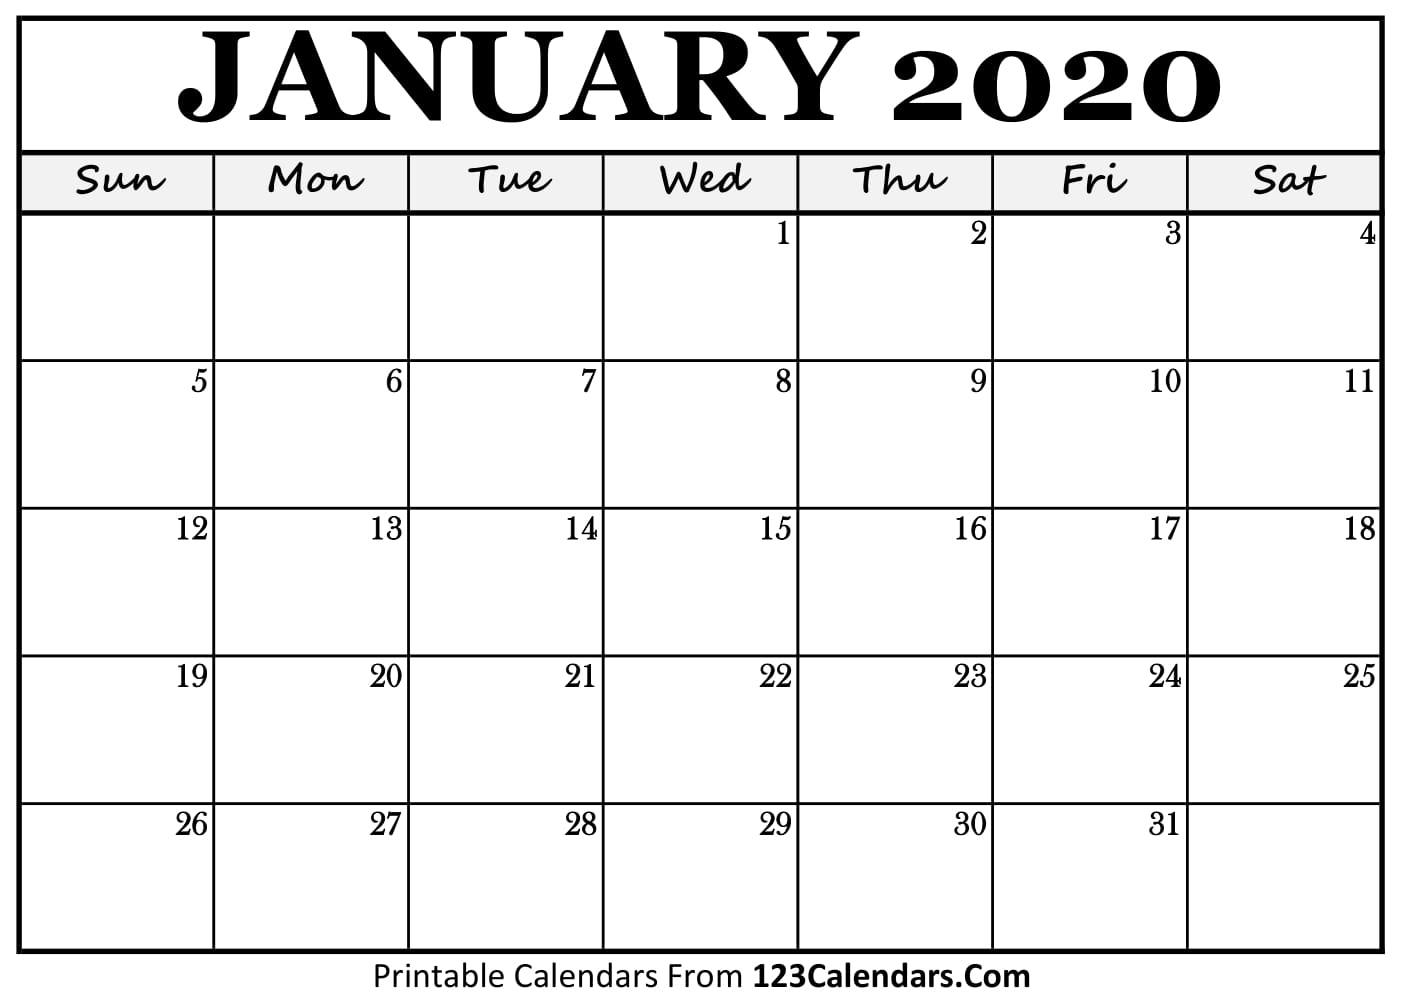 Free Printable Calendar | 123Calendars intended for 2020 Free Printable Calendars With Lines Without Downloading